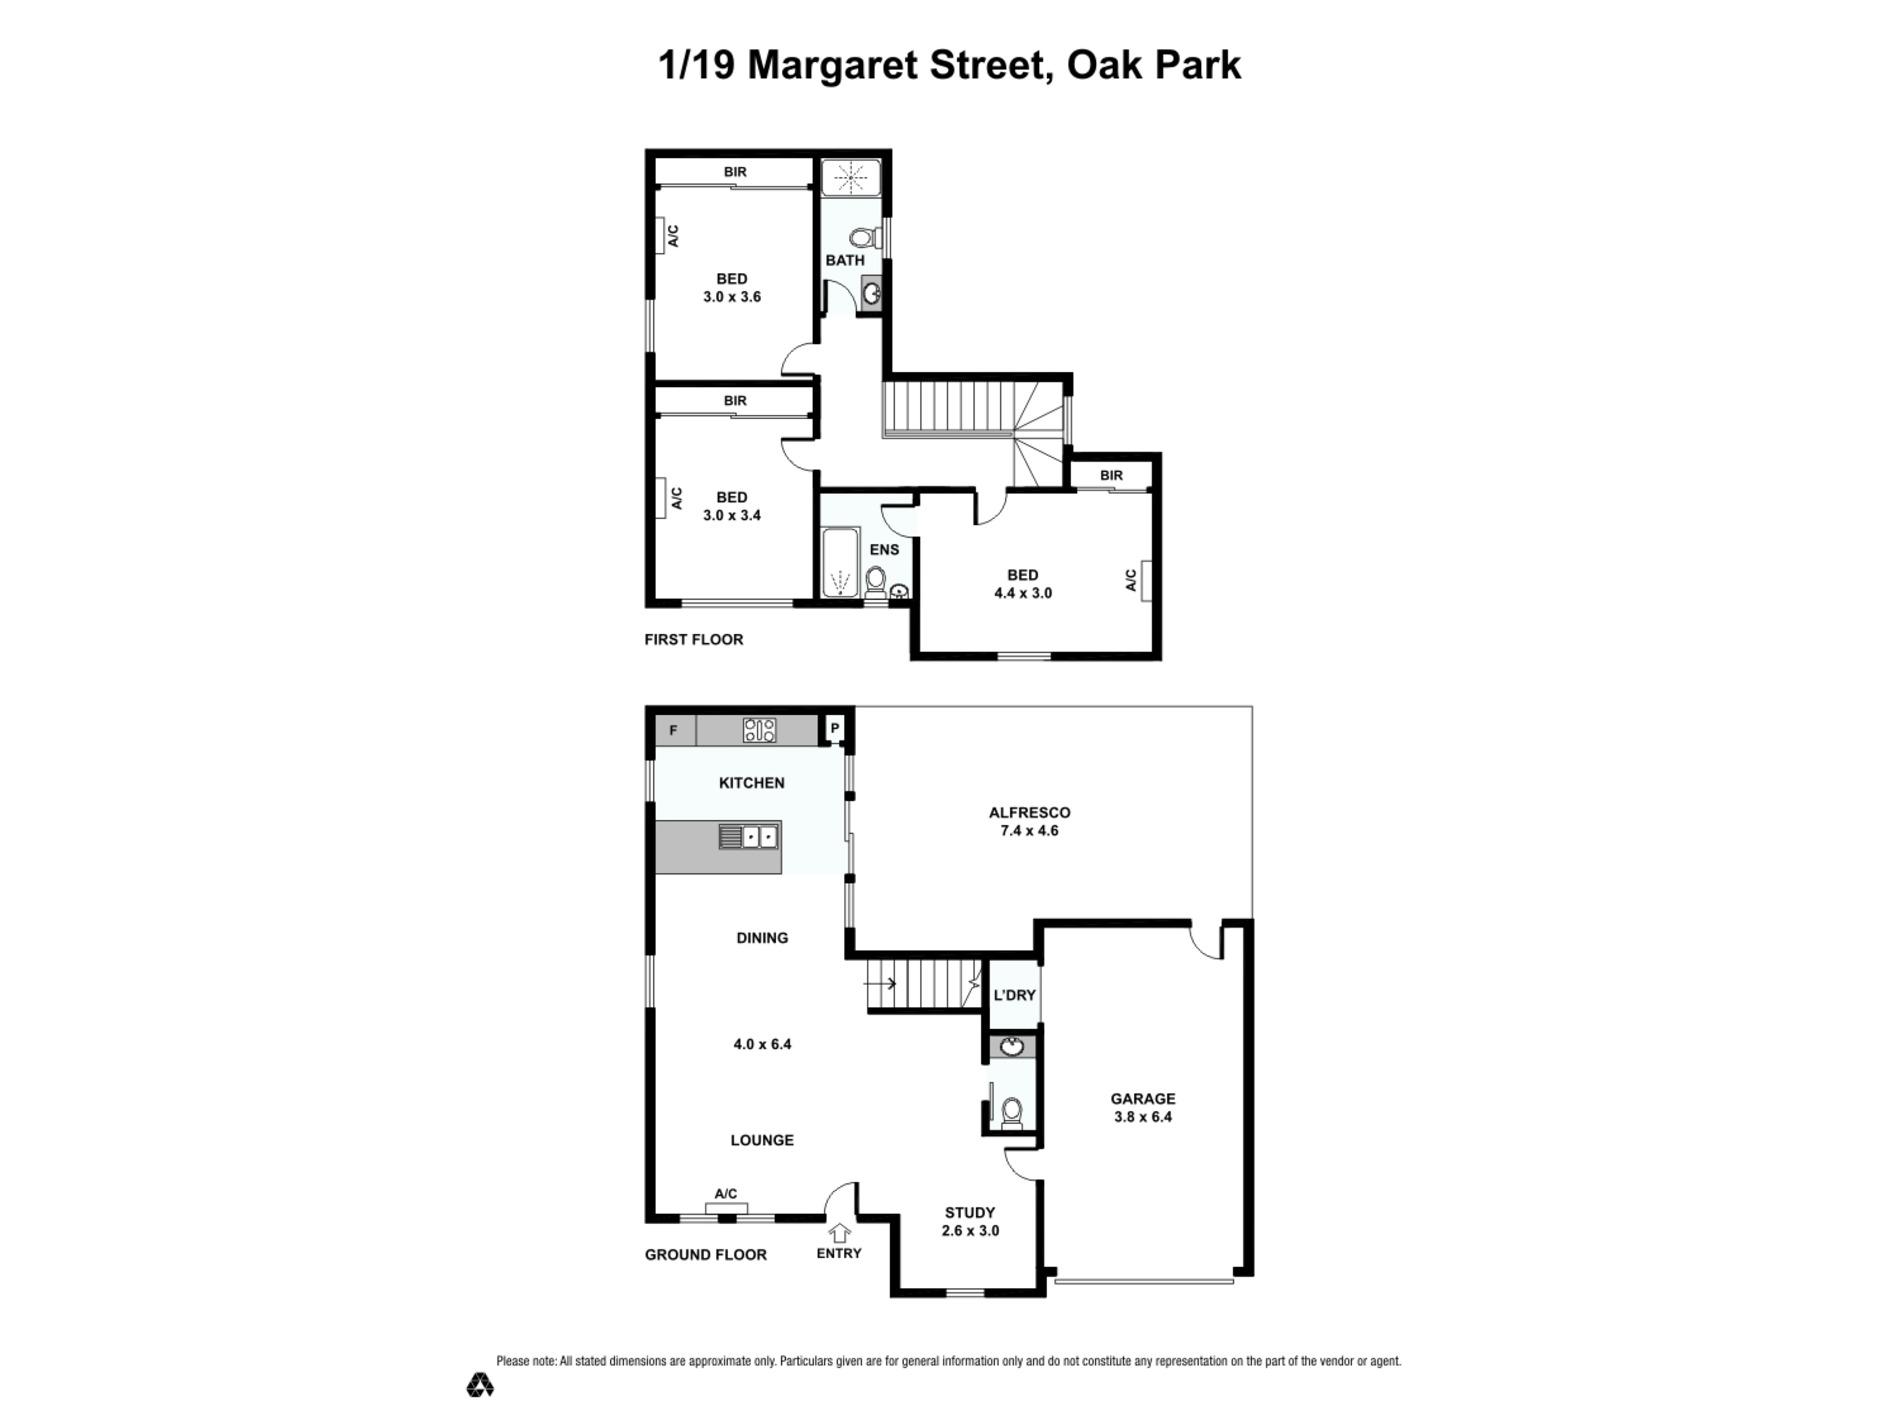 1 / 19 Margaret Street, Oak Park